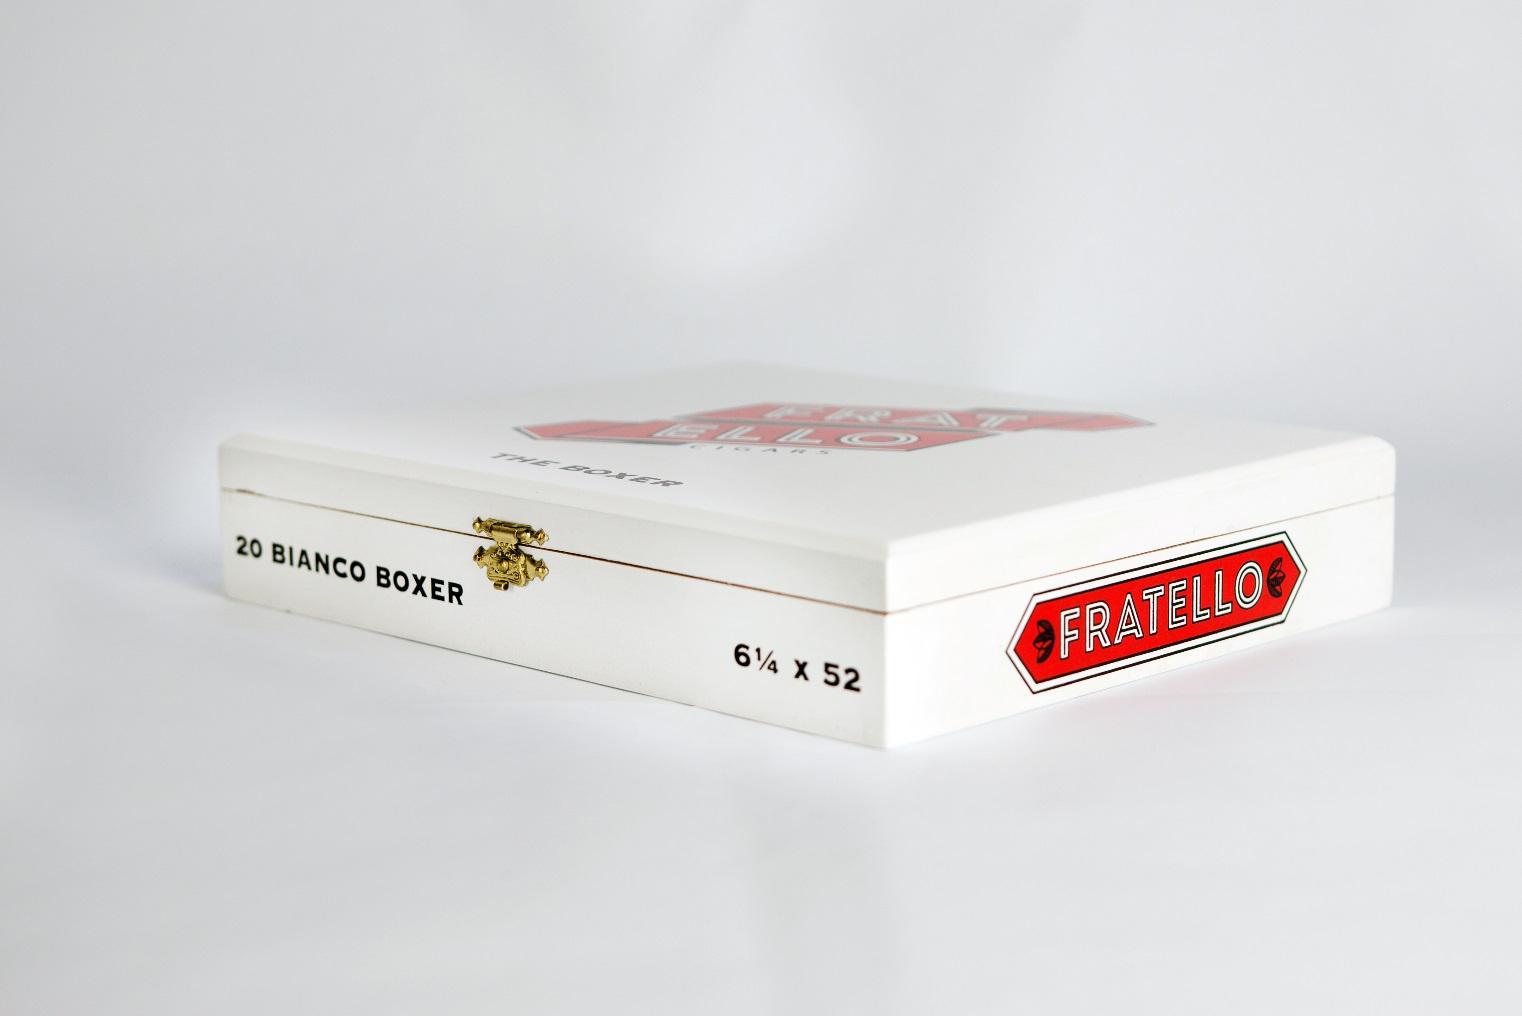 Fratello_Bianco_Boxer_Box